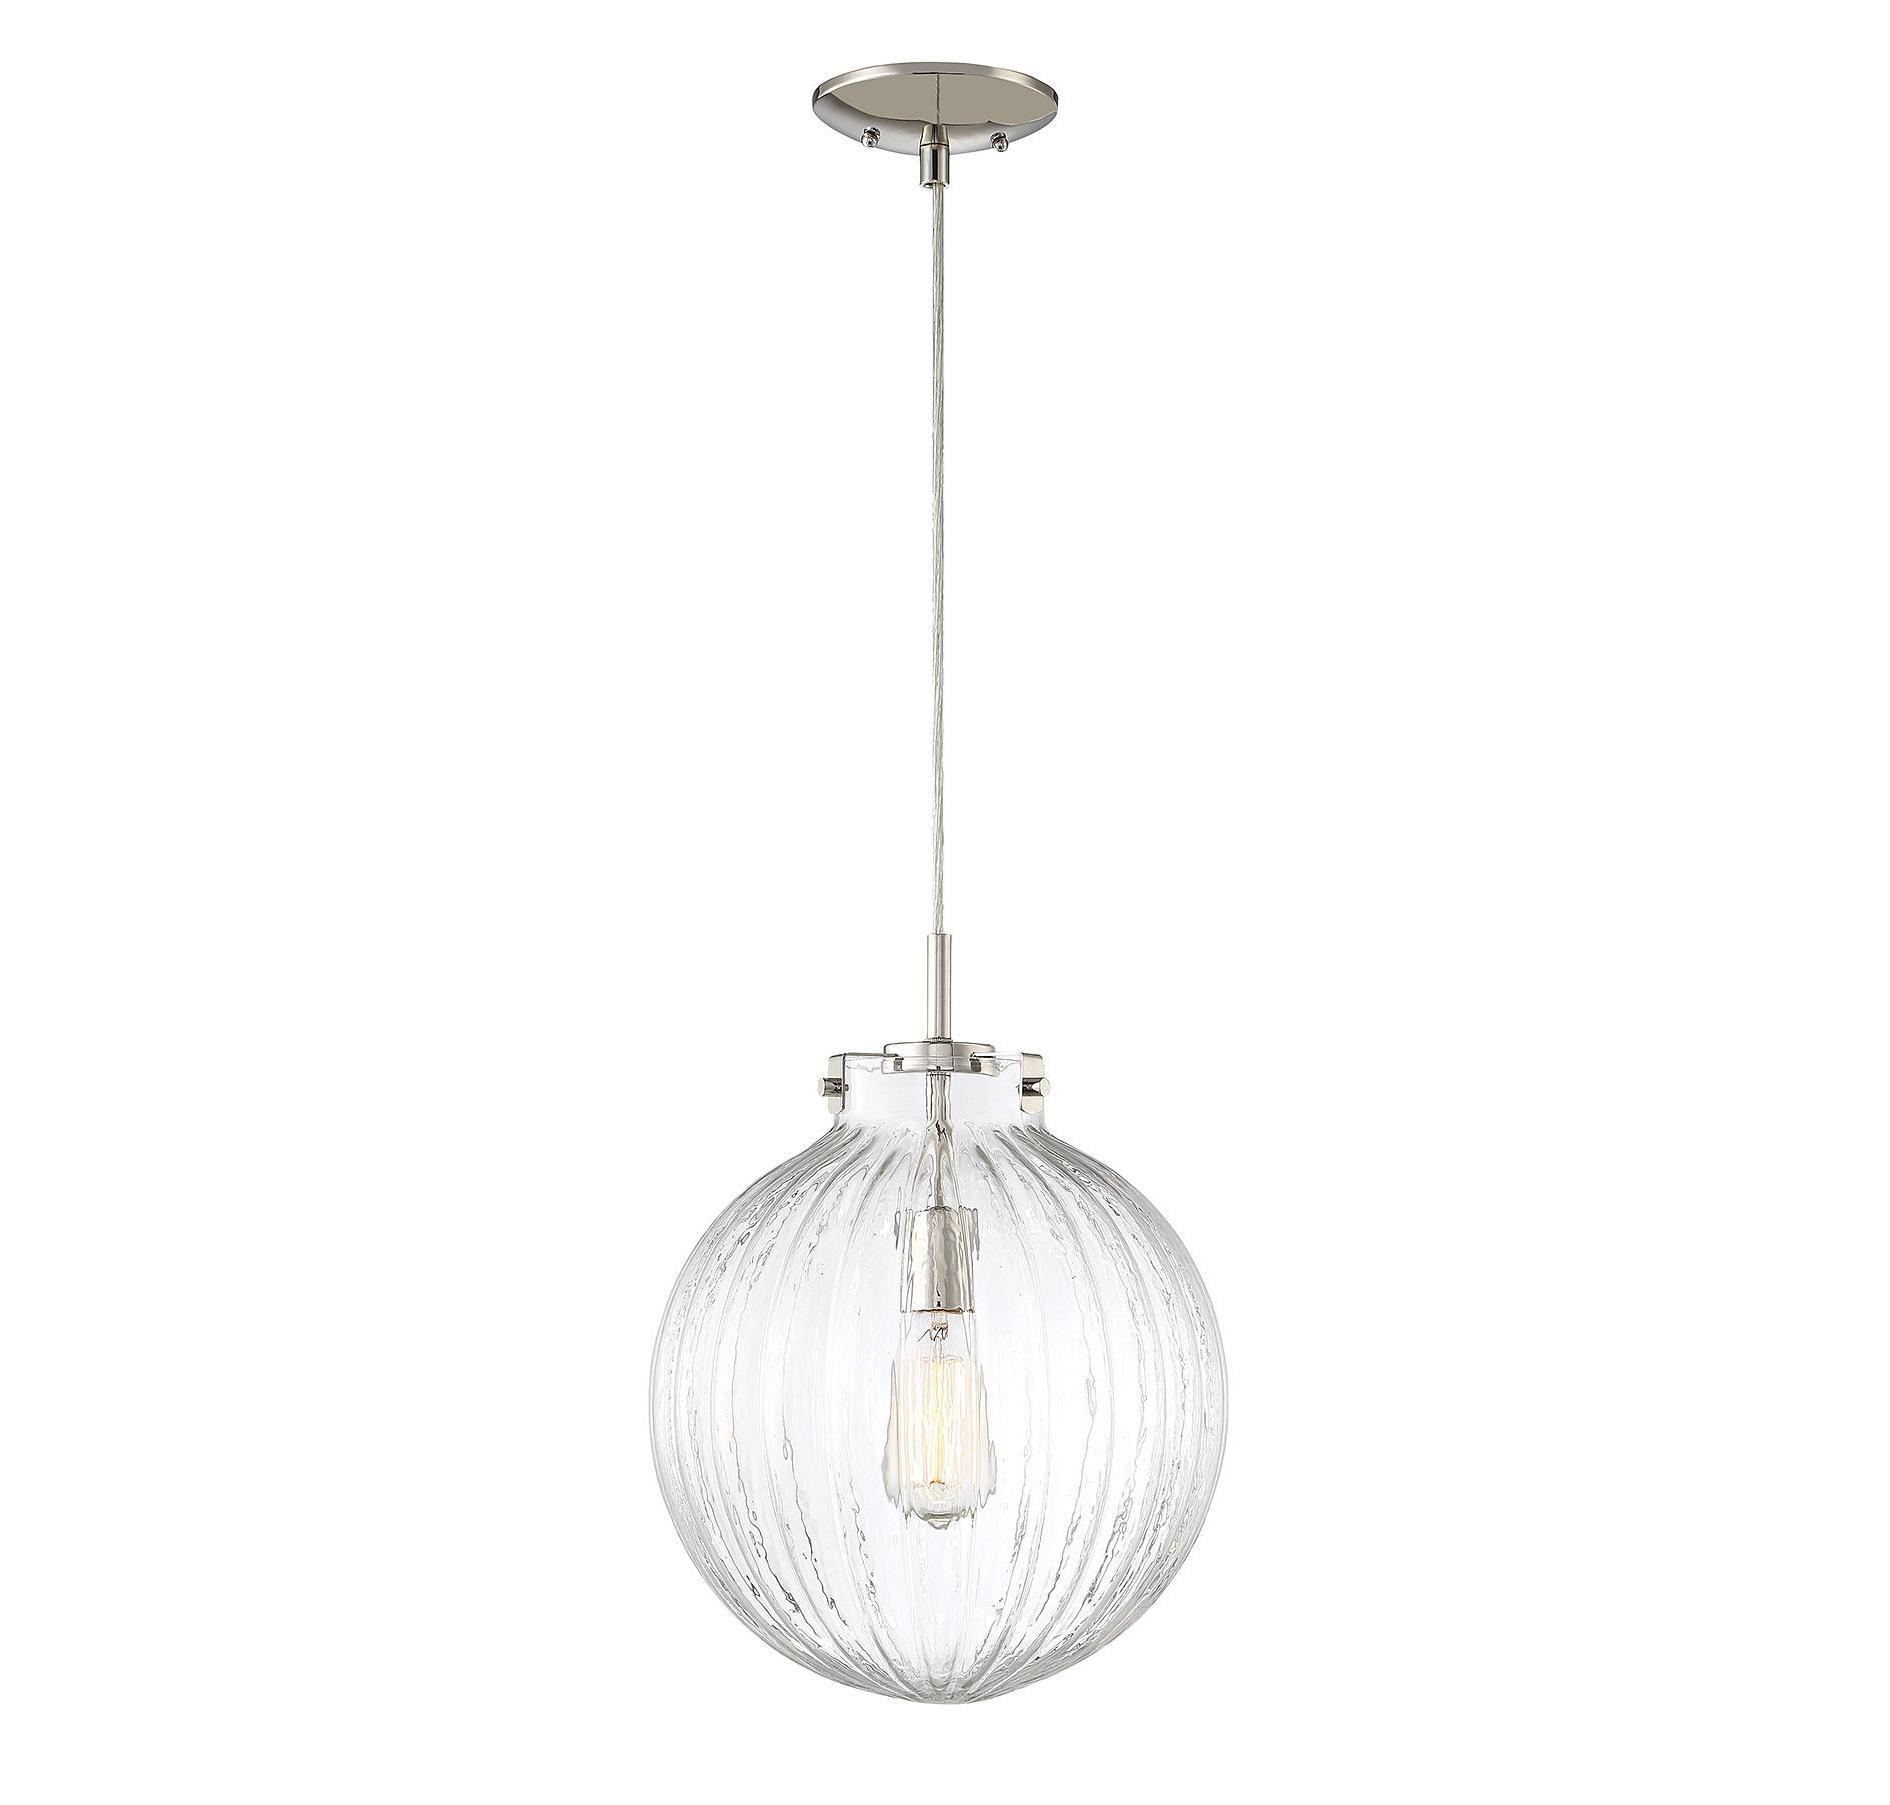 Widely Used Nevels 1 Light Single Globe Pendant Intended For Demi 1 Light Globe Pendants (View 6 of 20)